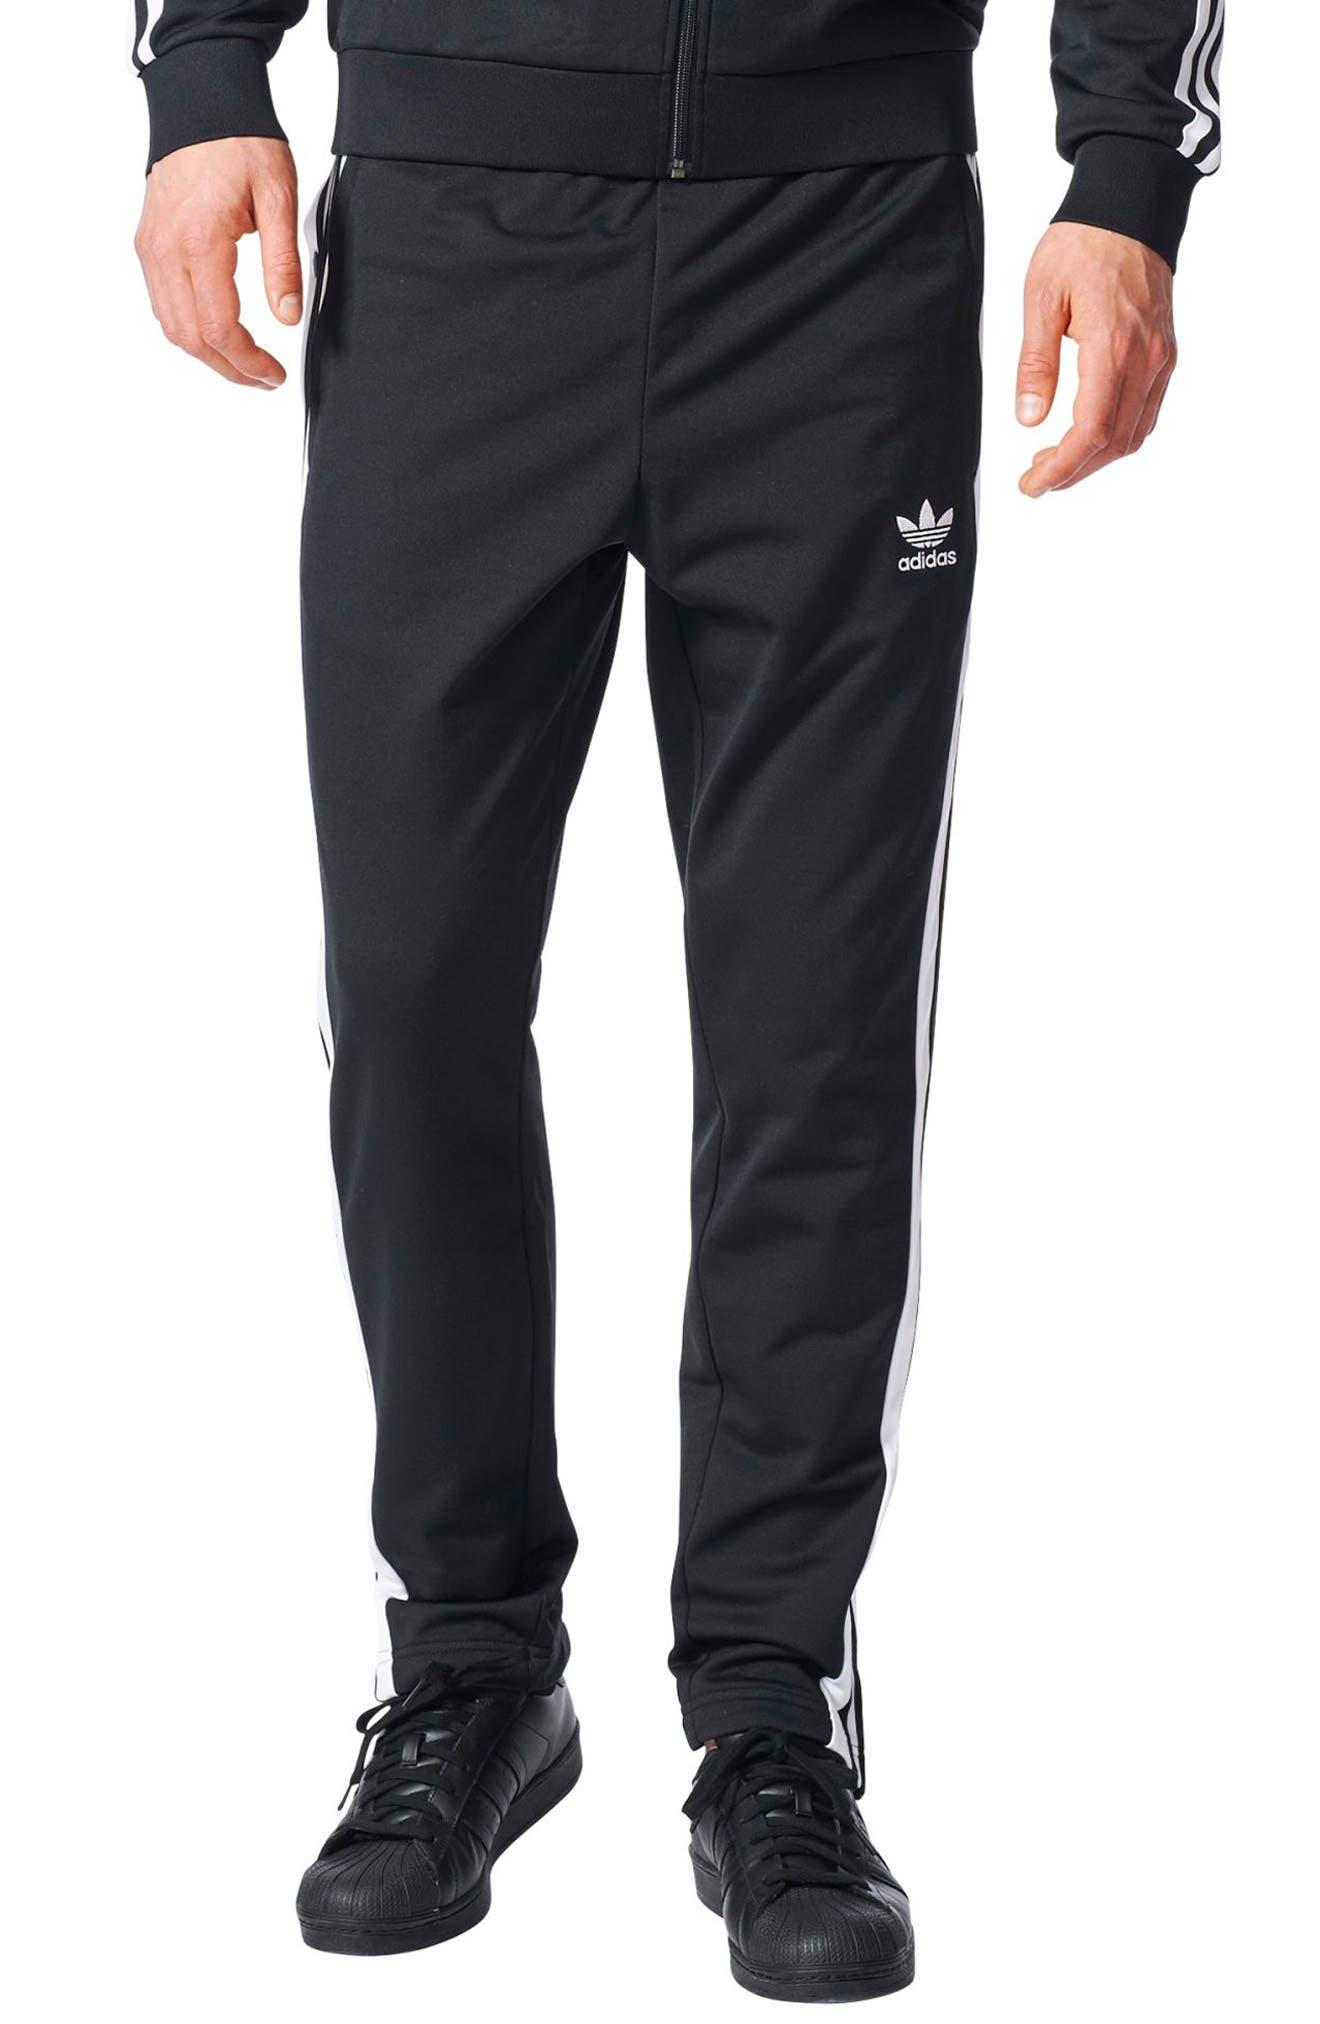 Main Image - adidas Originals Adibreak Tearaway Track Pants